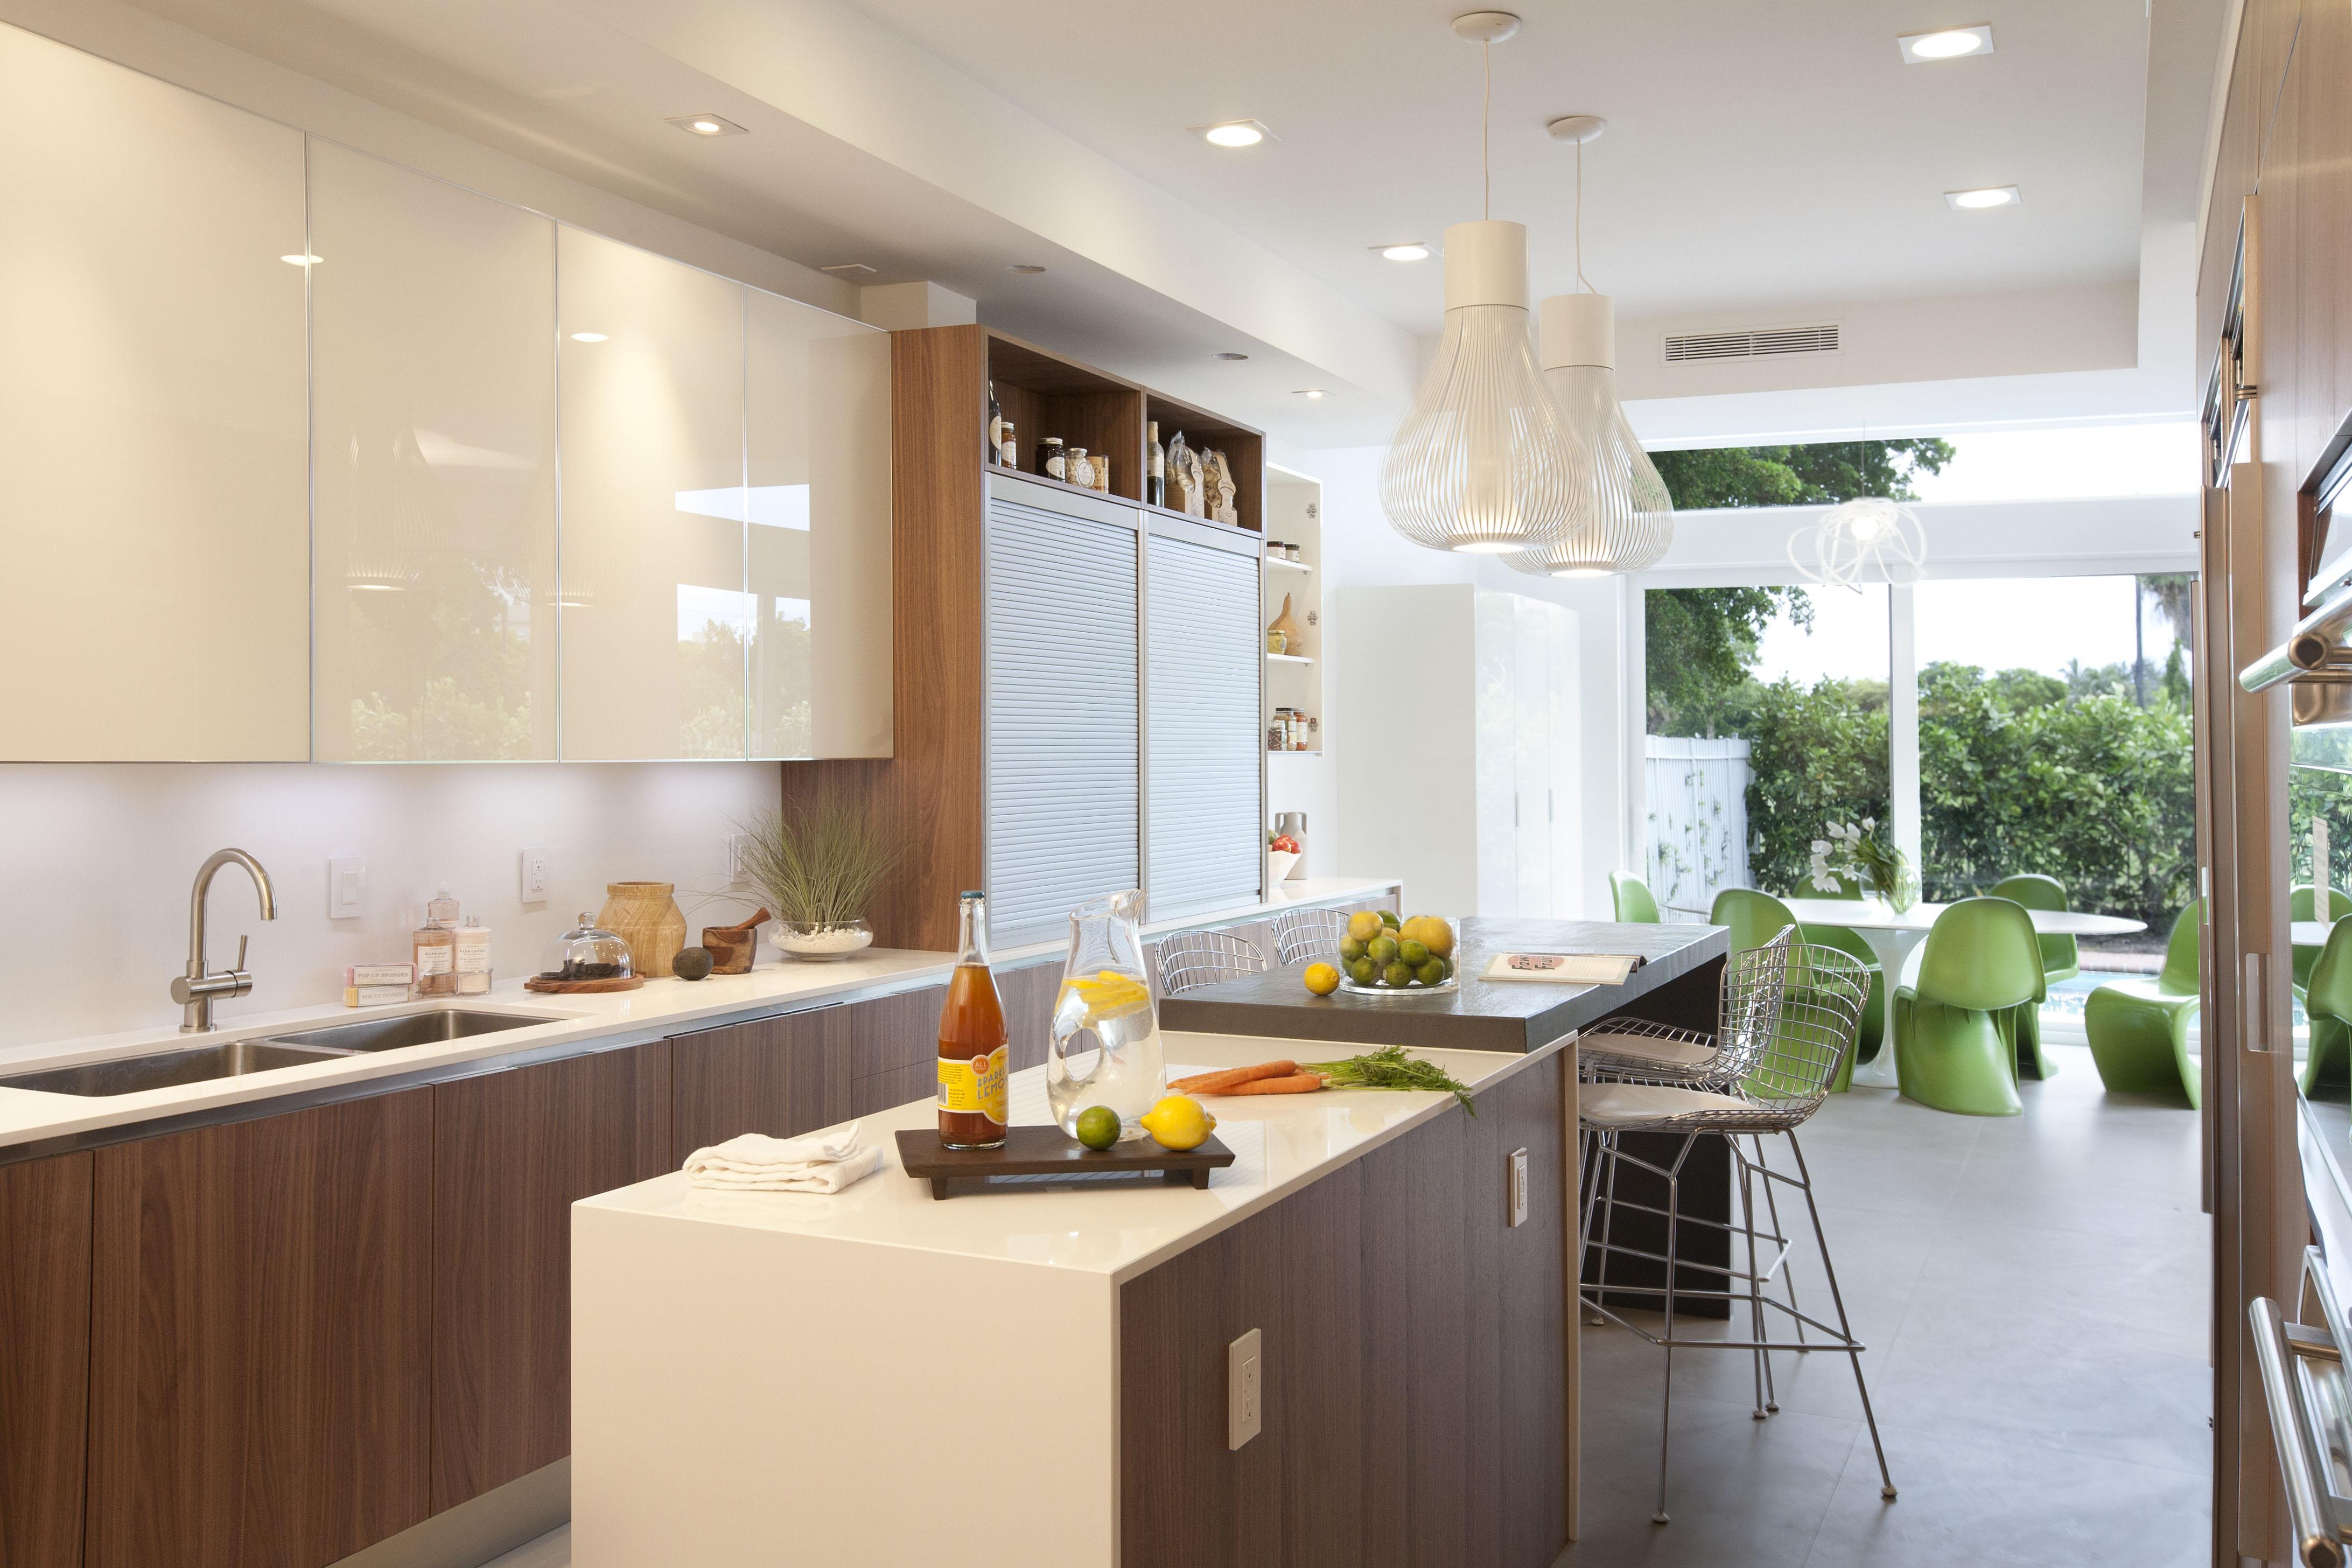 Furniture Ikea Bedroom Design Ideas Wallpaper Likes Miami